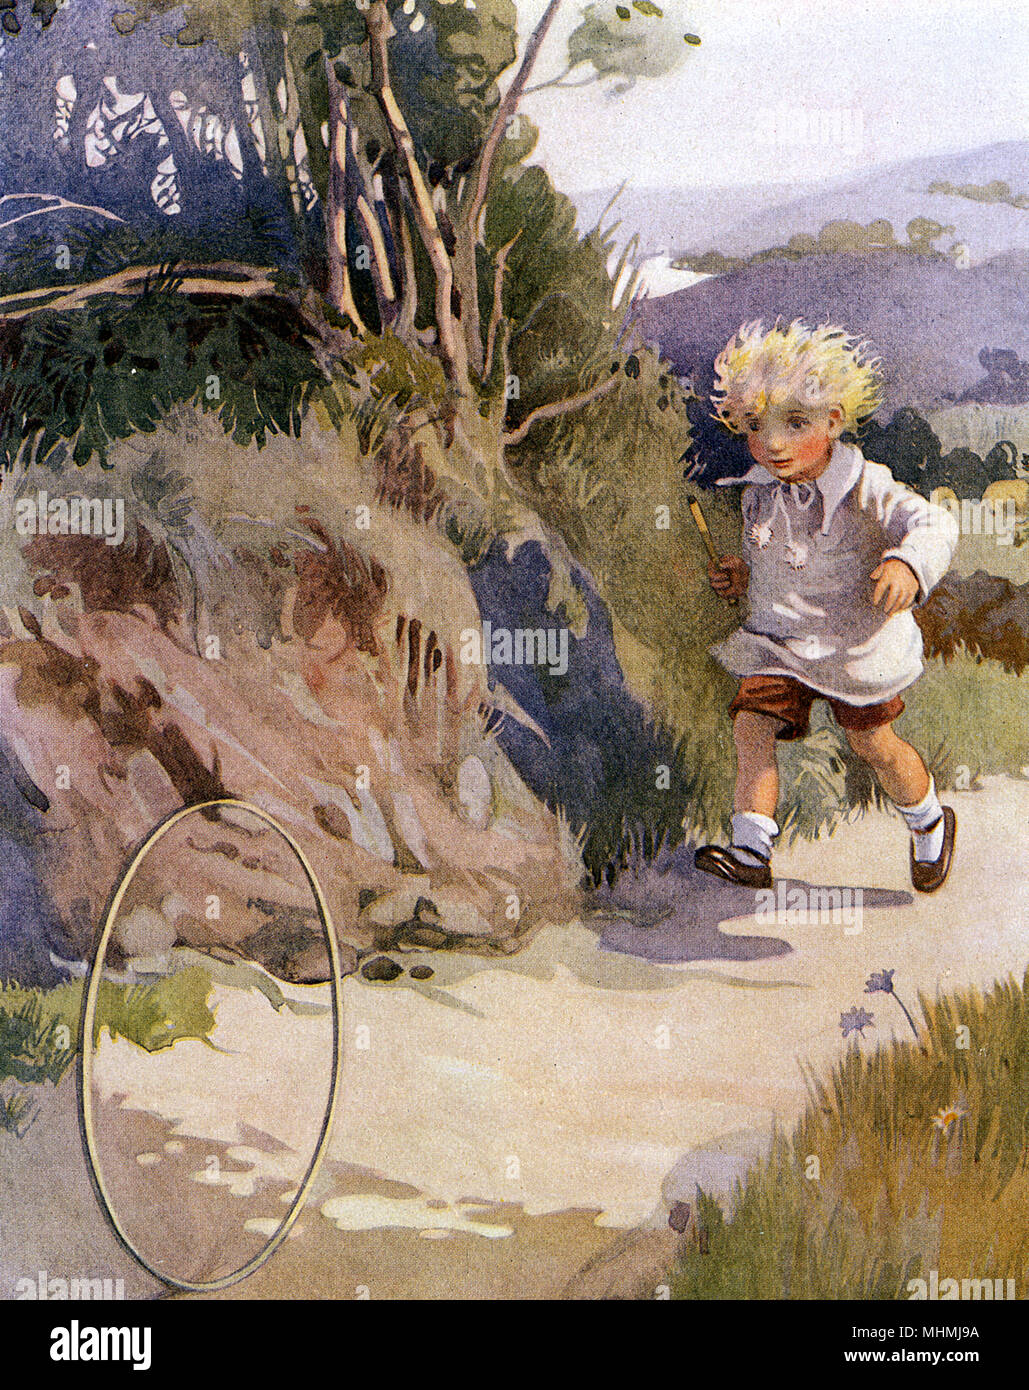 Il Runaway hoop Data: tardo XIX secolo Immagini Stock